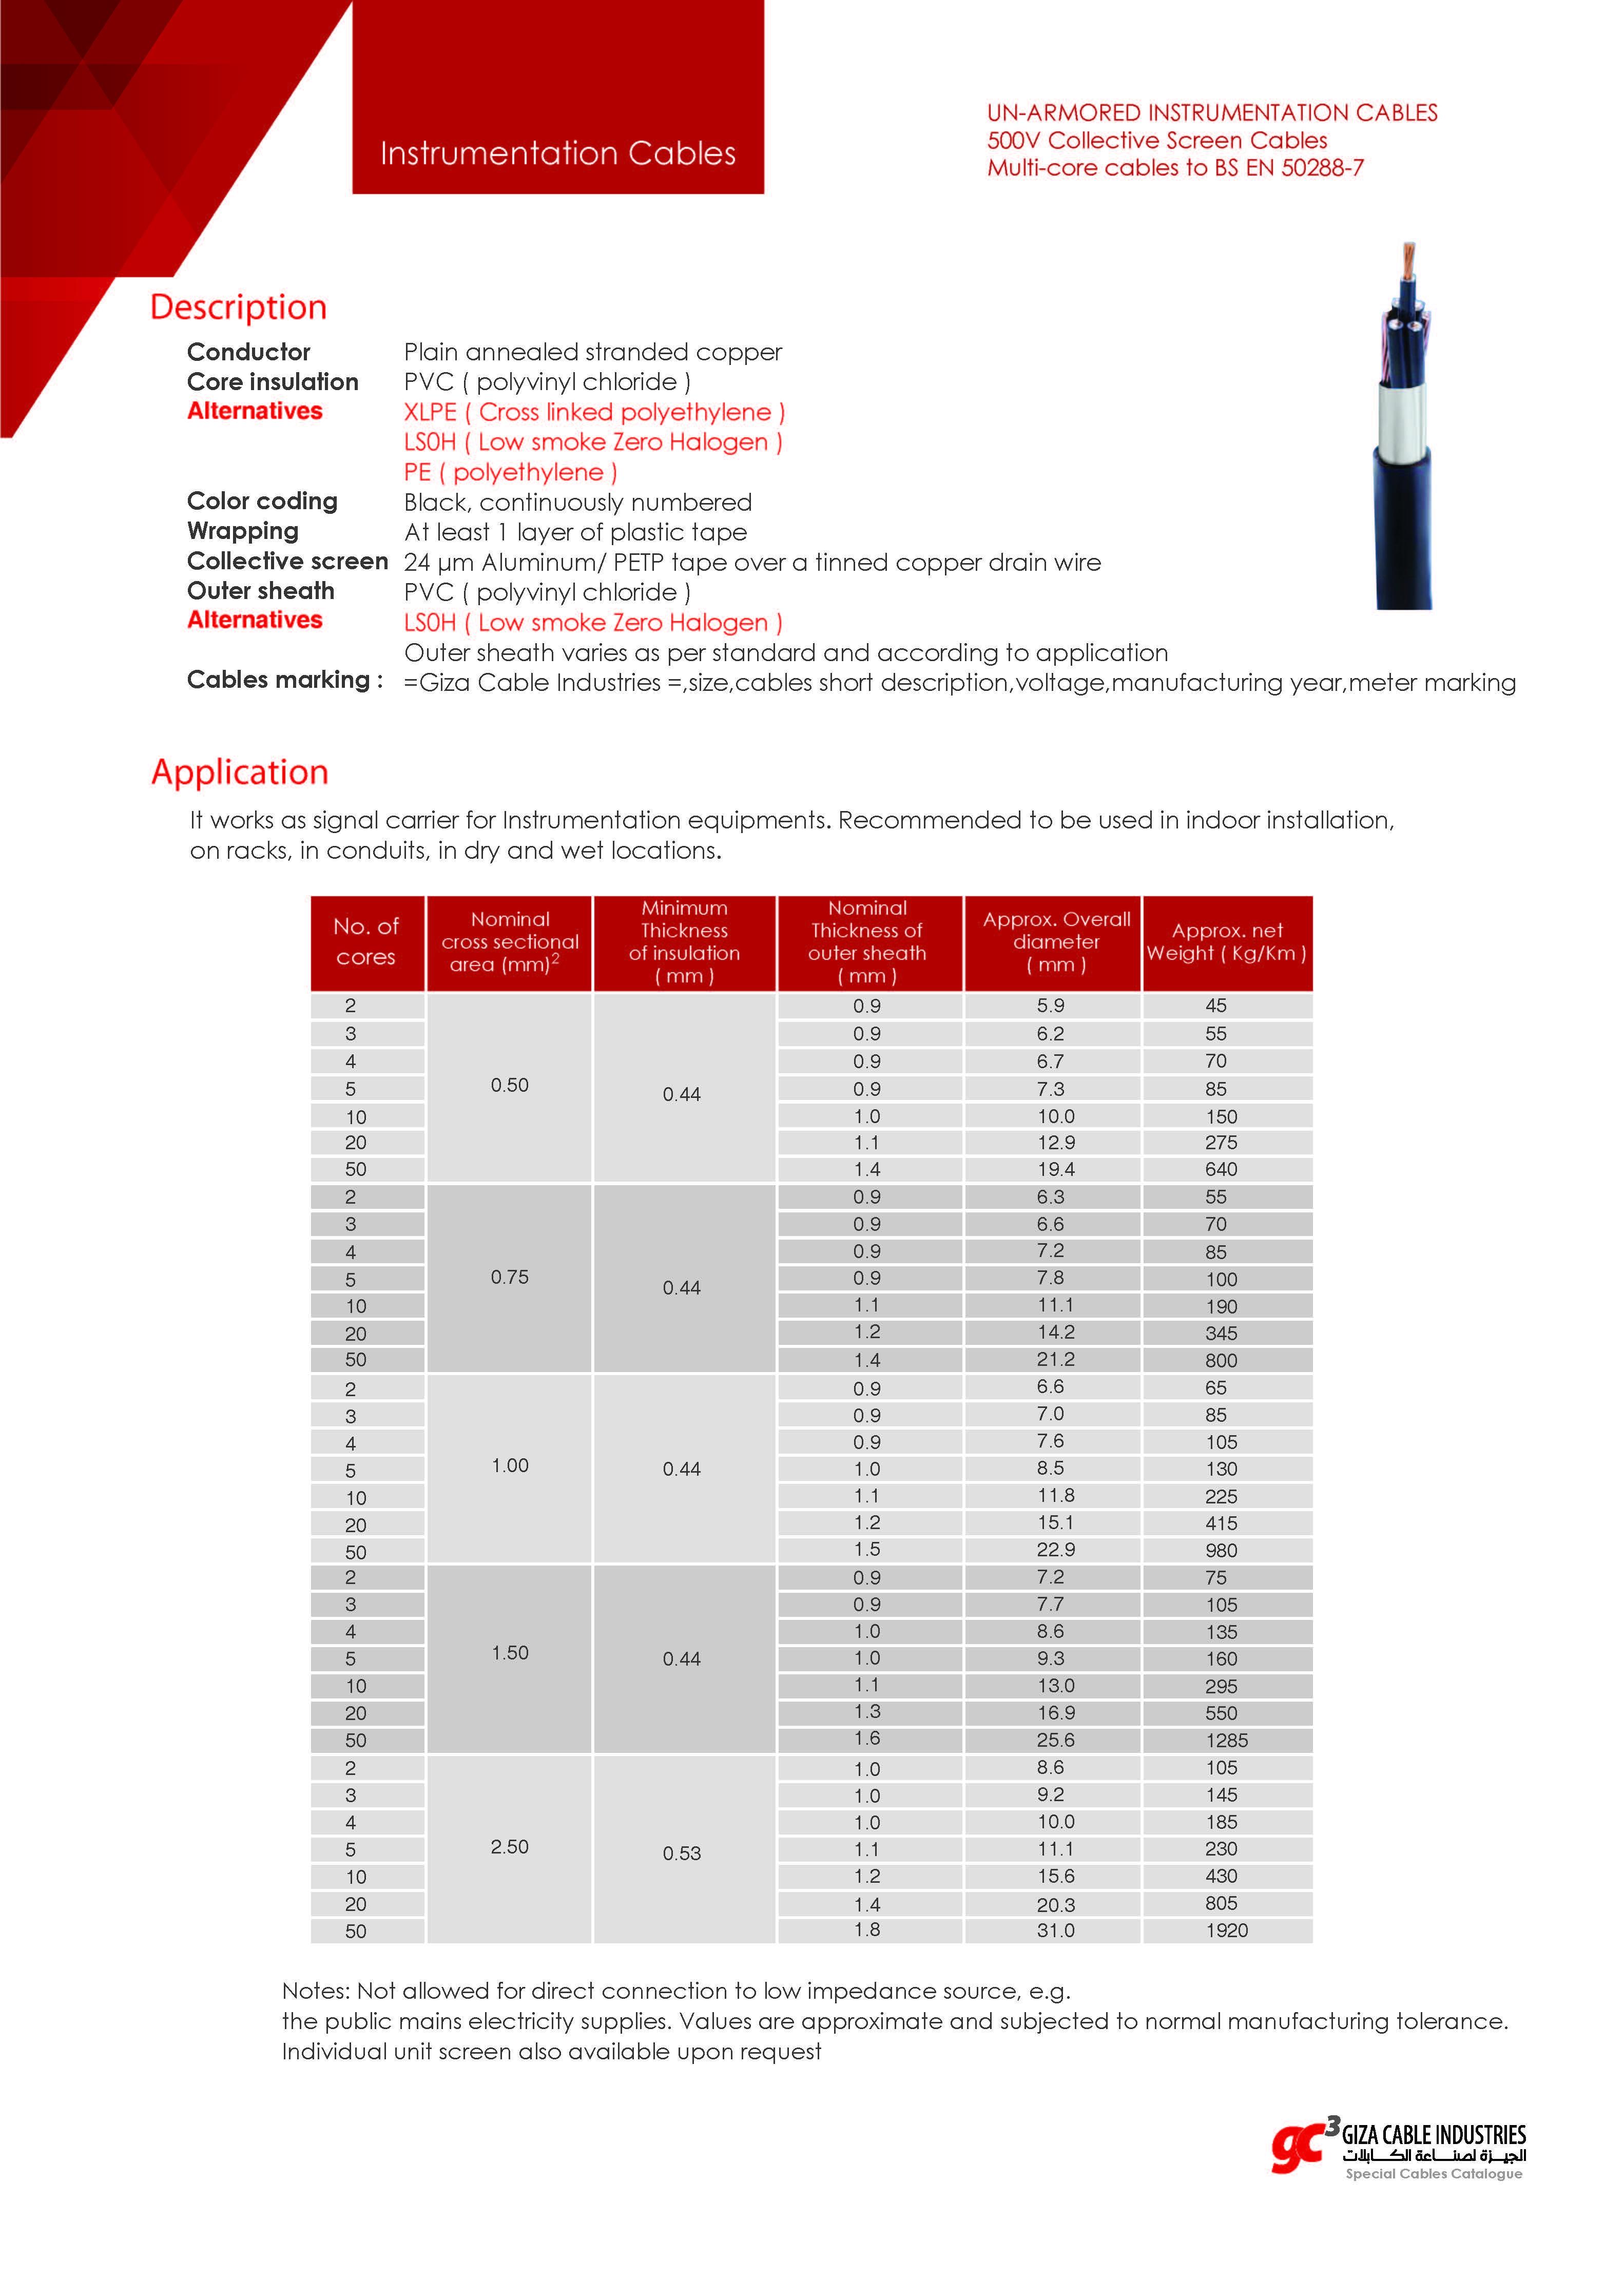 UN-ARMORED INSTRUMENTATION CABLES - 500V - Multi-core cables